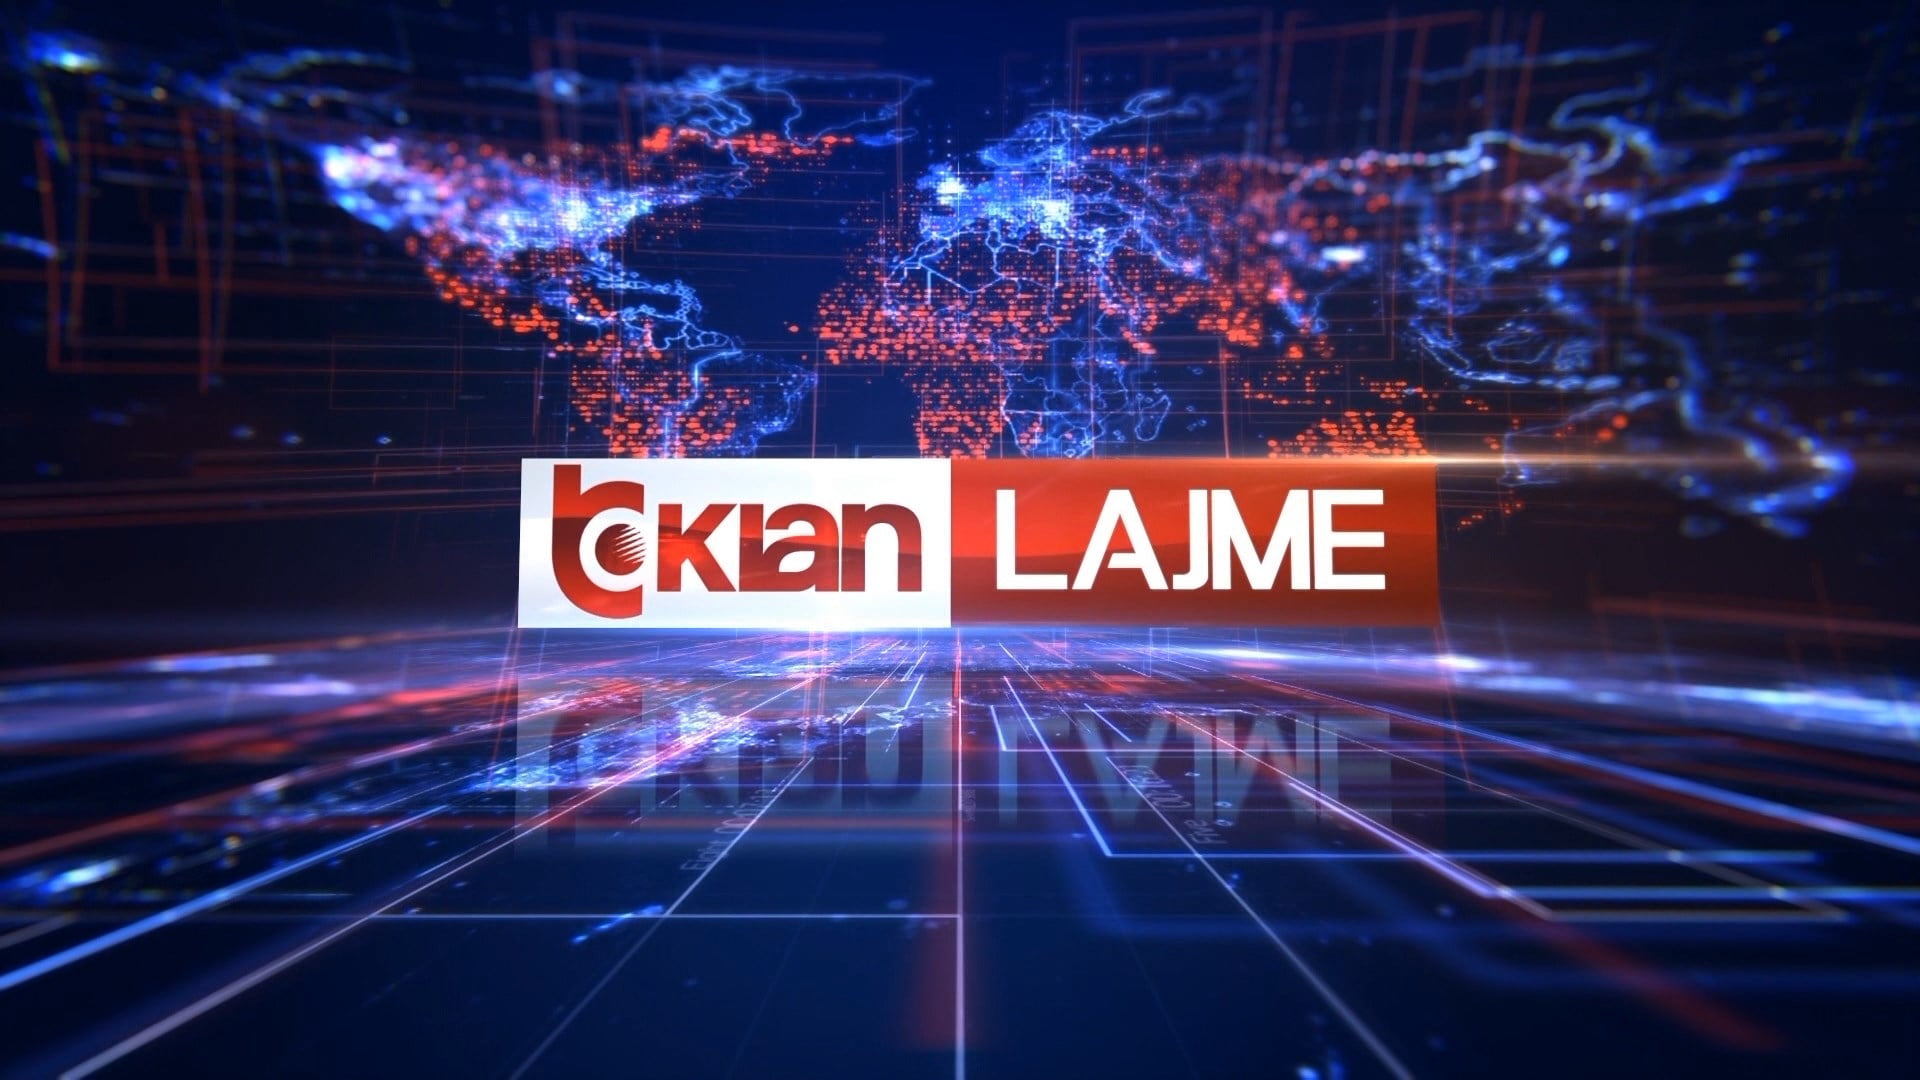 lajme-tv-klan-28-shtator-2020-ora-12-00